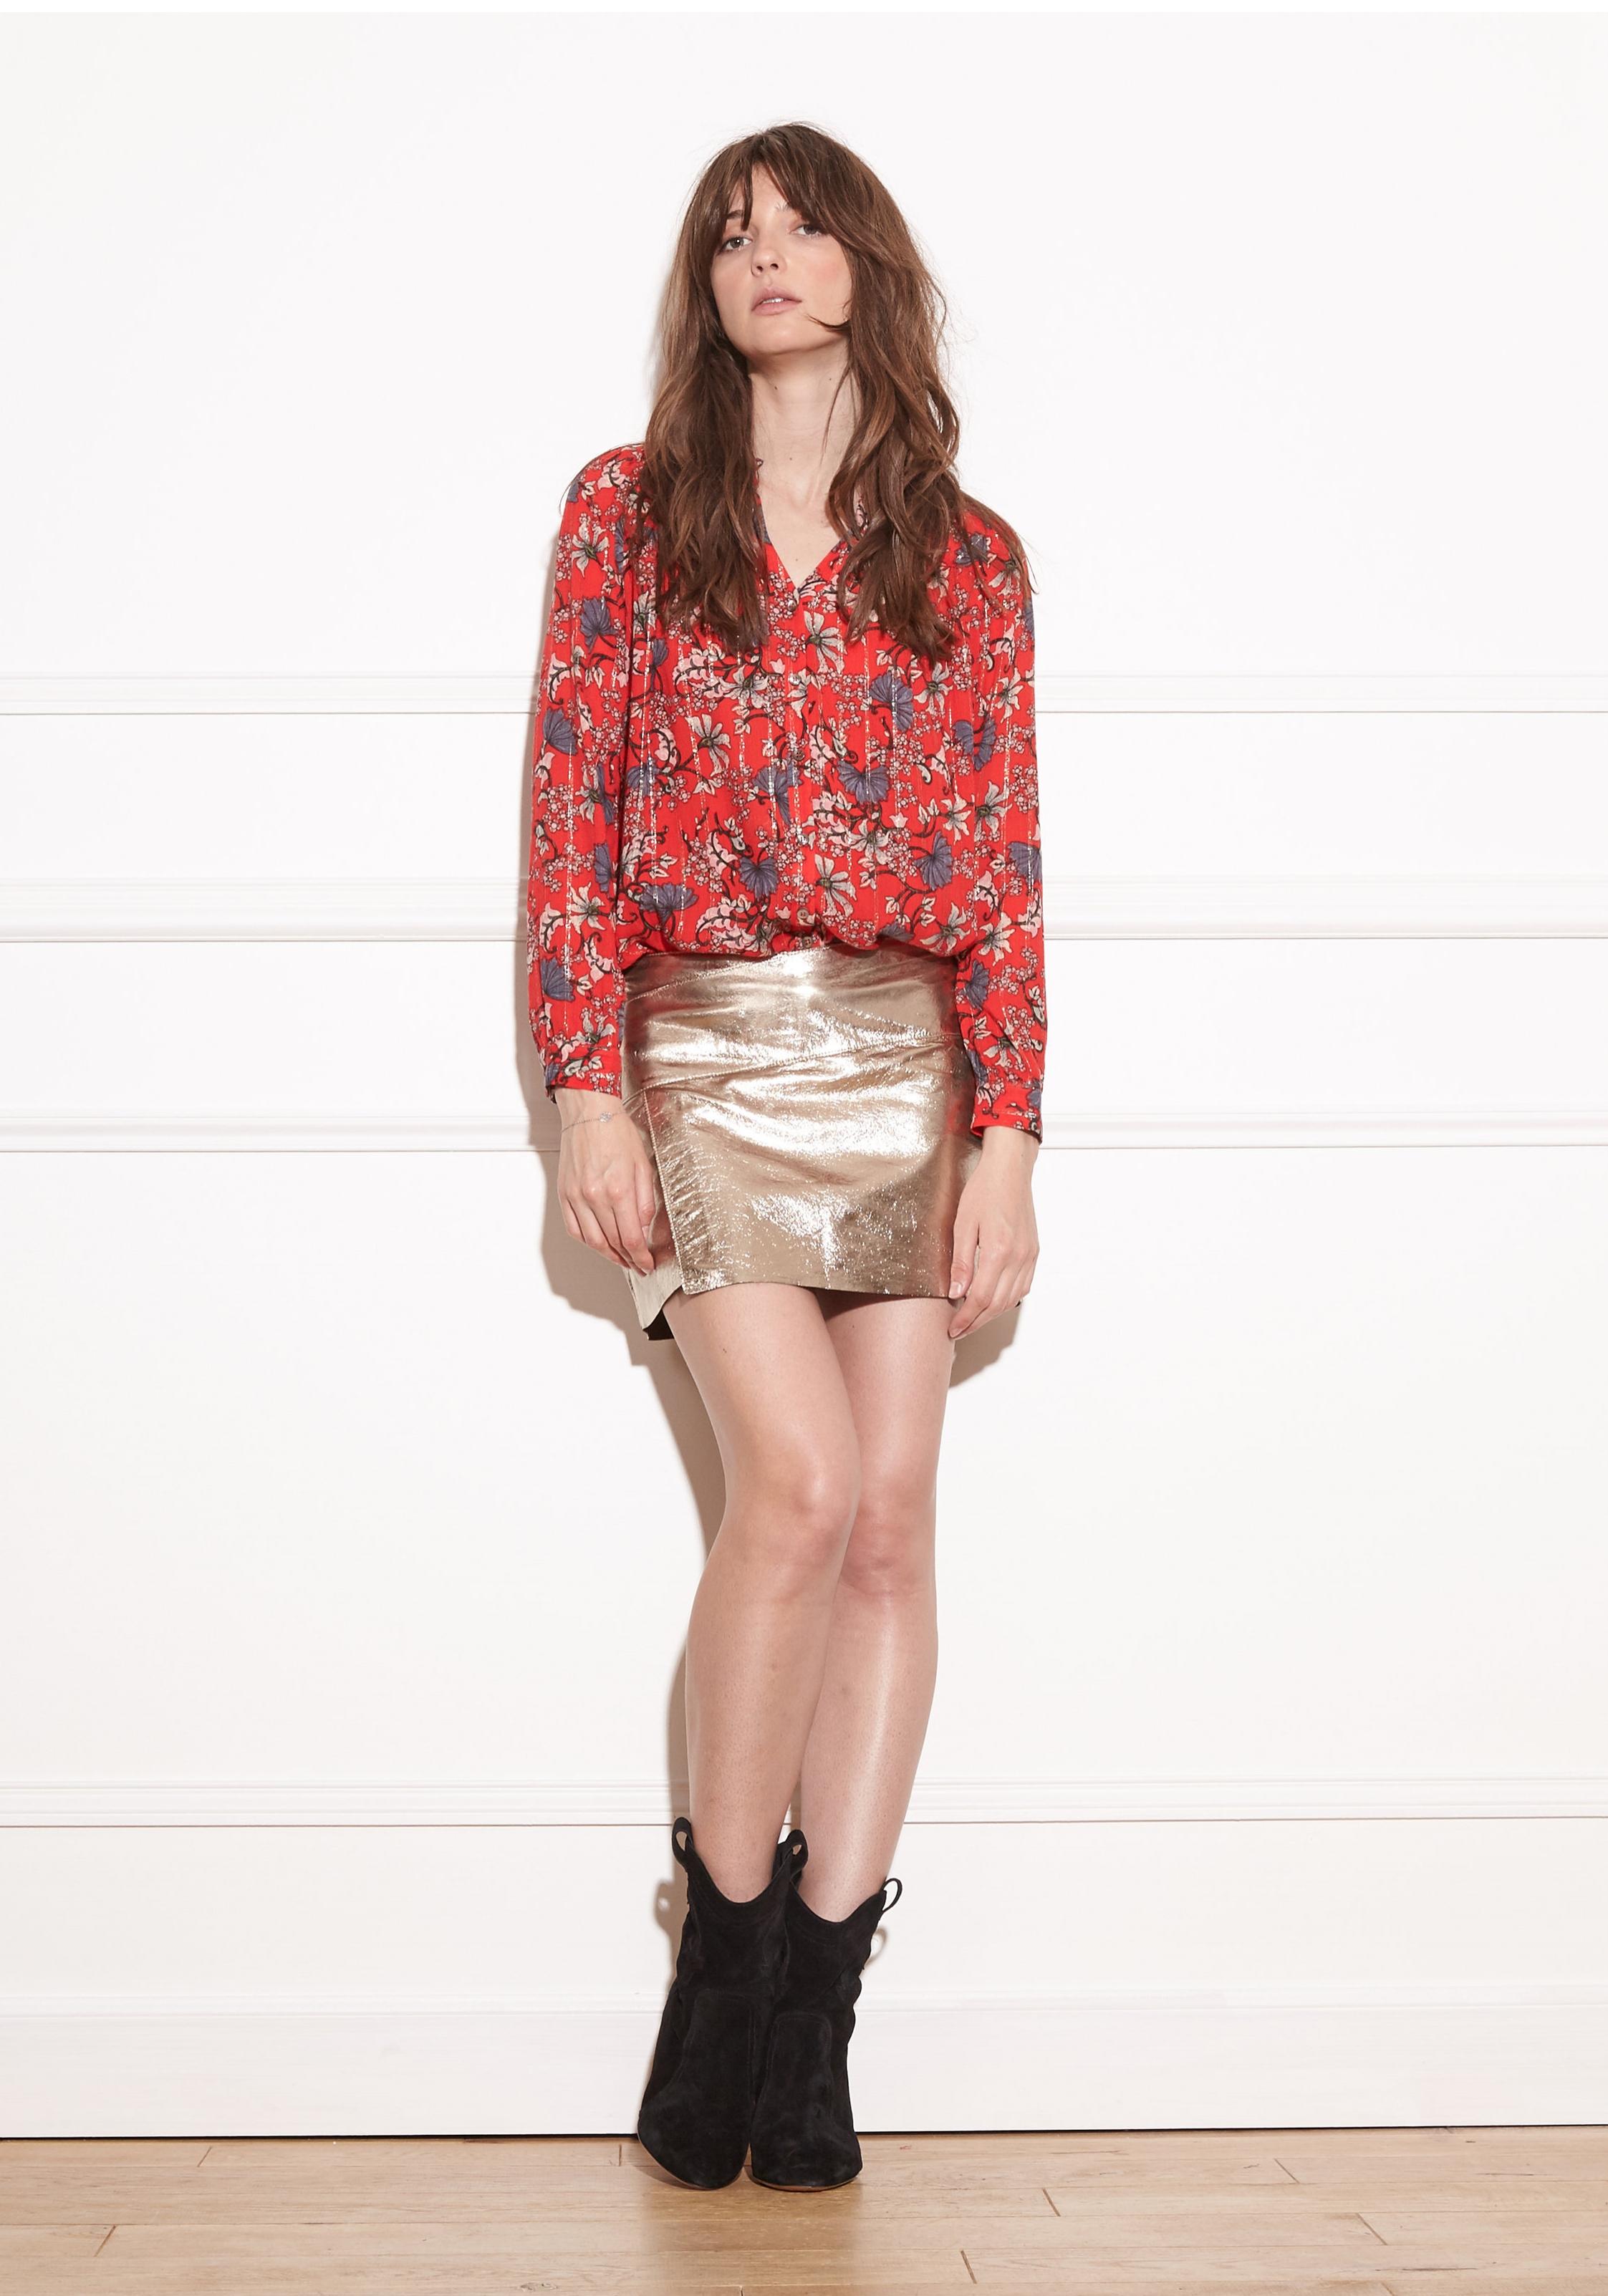 YRUCE skirt-EDGY blouse.jpg